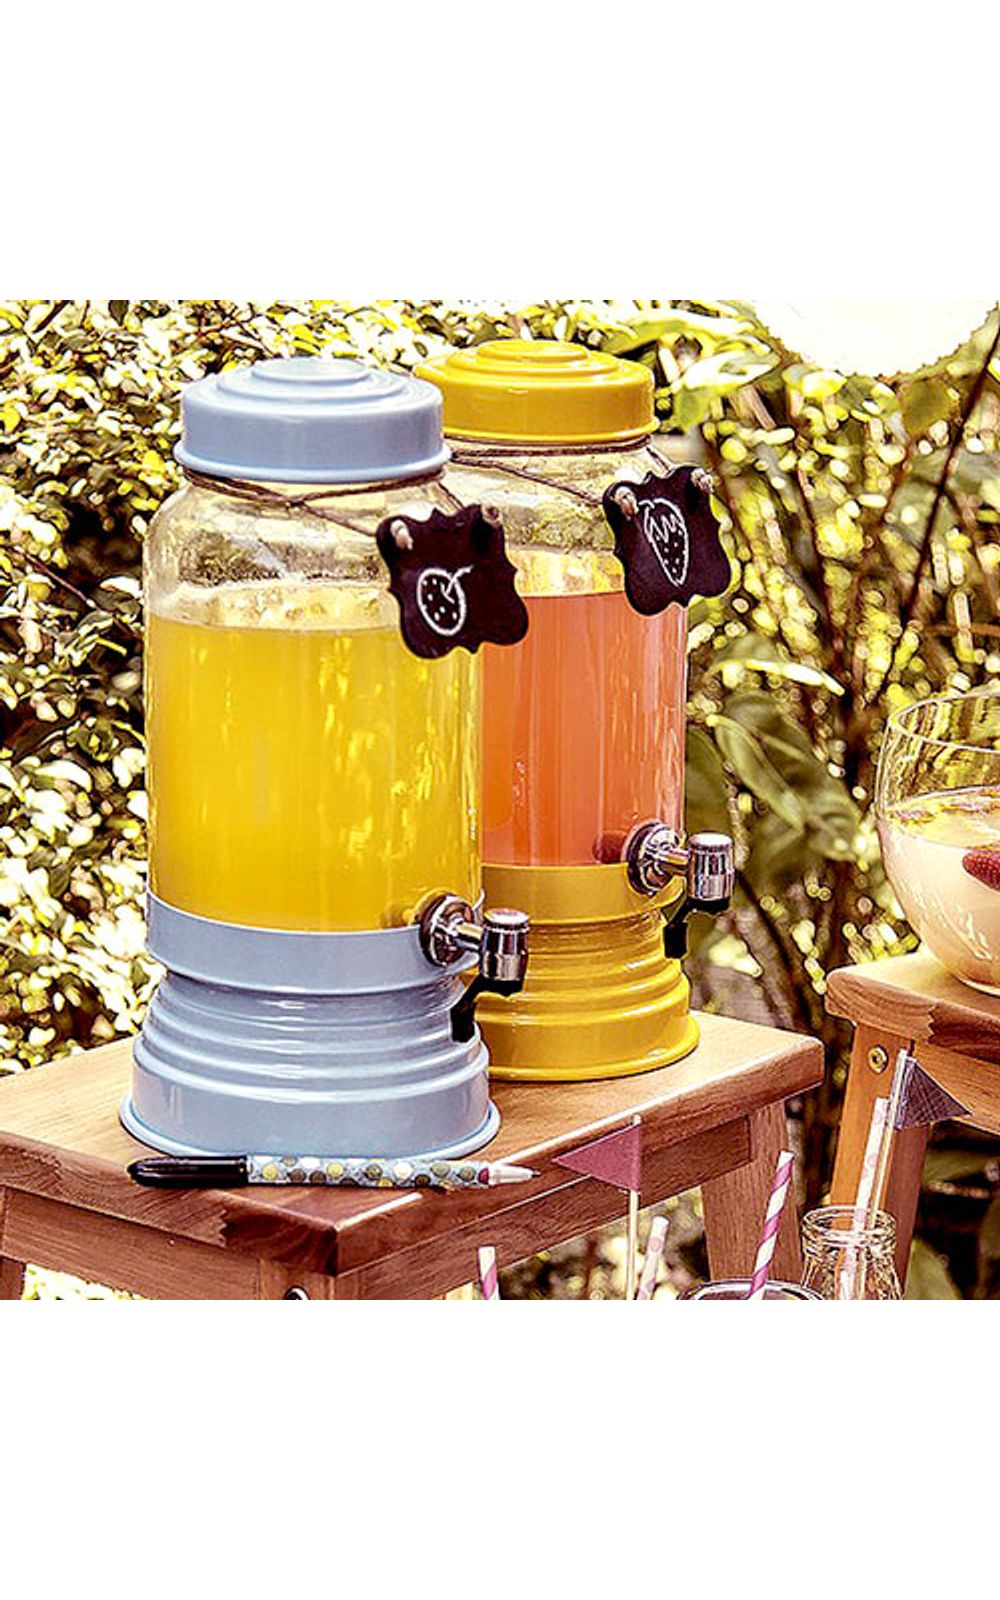 Foto 3 - Suqueira de Vidro 3,2 litros Lilas Claro